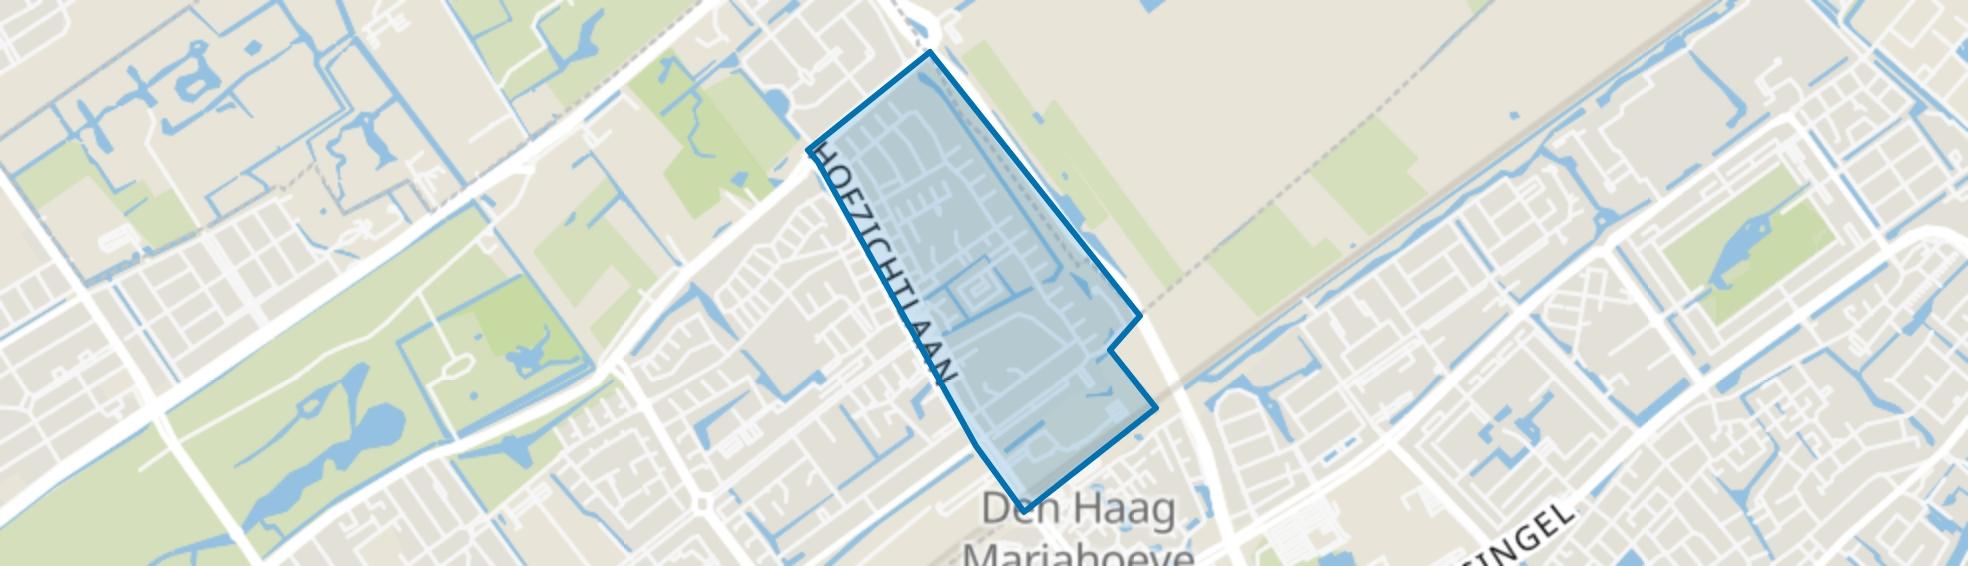 Landen, Den Haag map